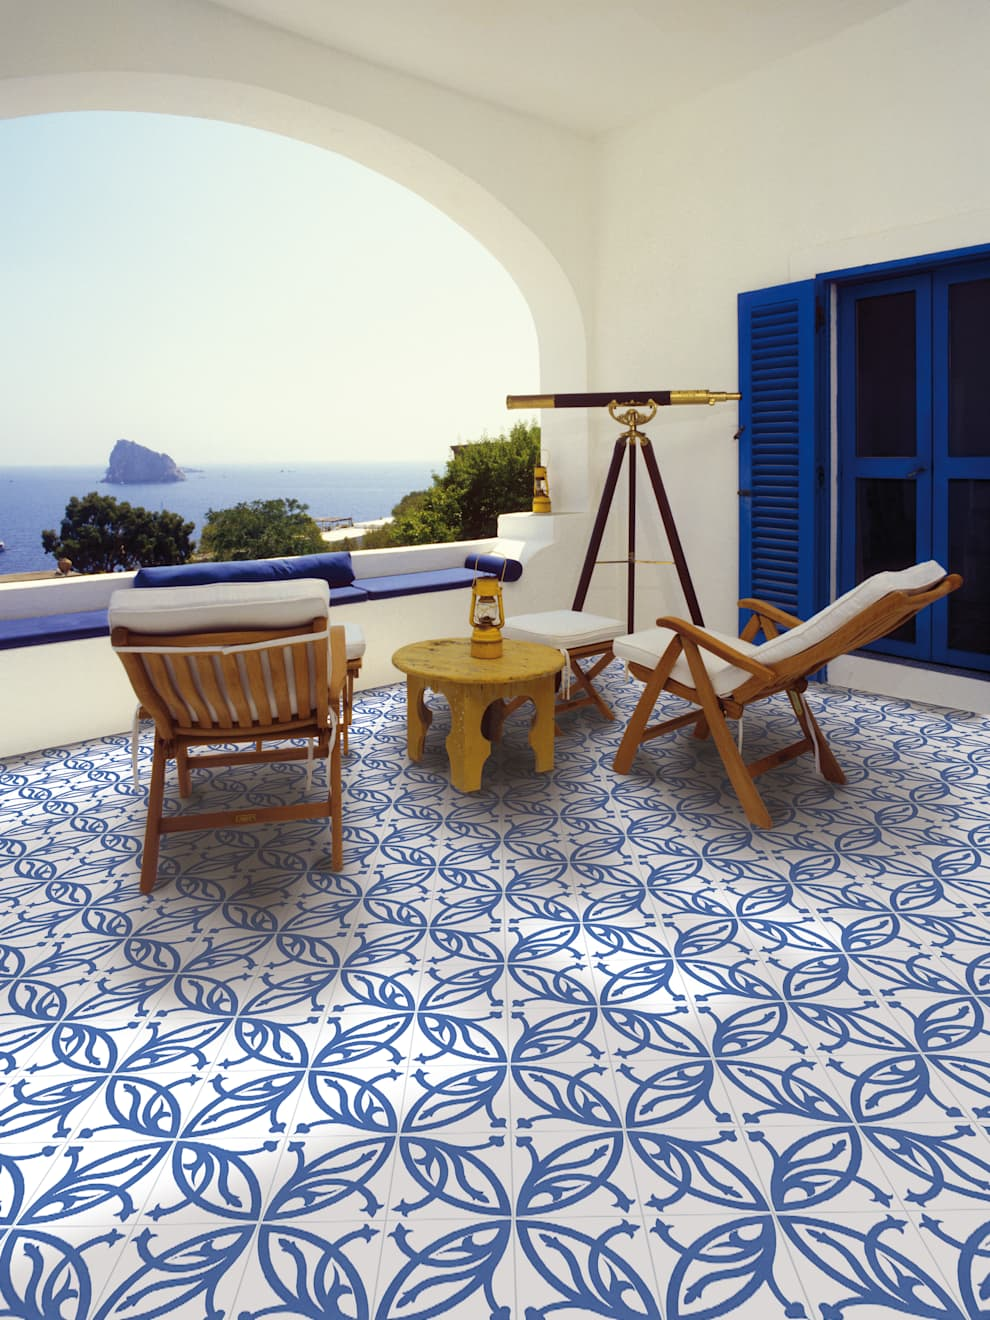 9 pisos para tu patio demasiado bellos para ser reales - Pavimentos para terrazas ...